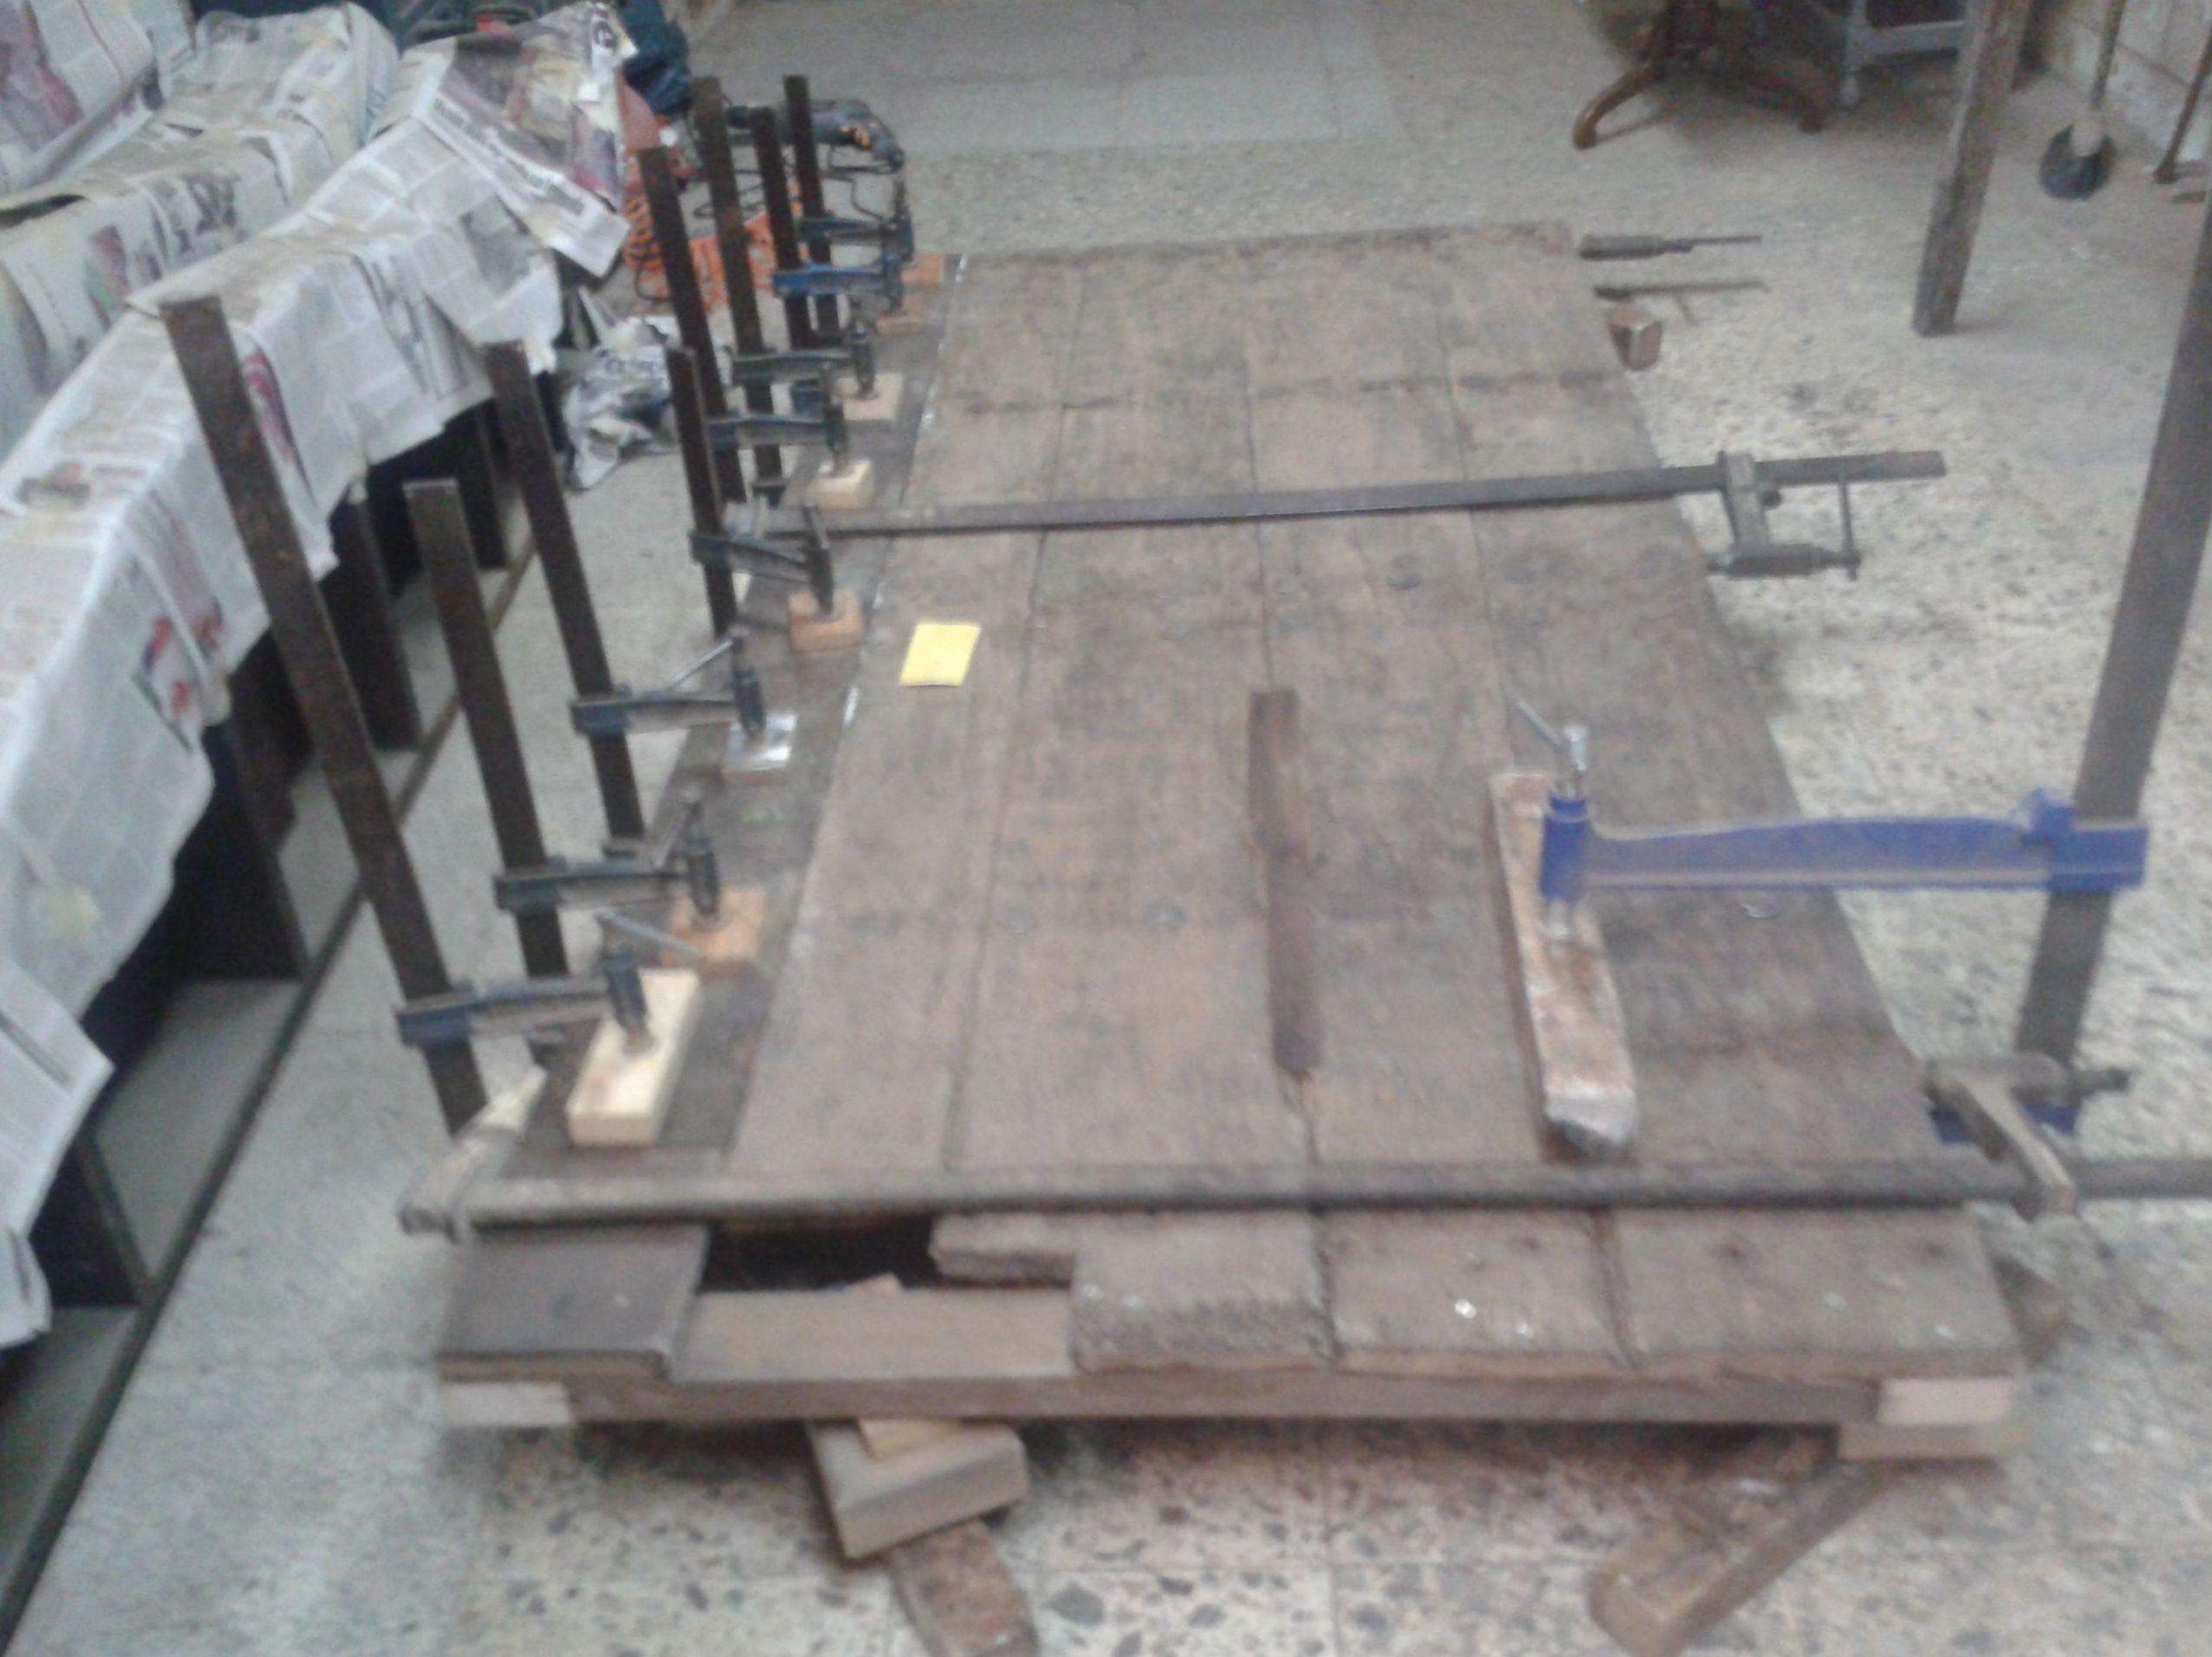 Foto 68 de Restauración de muebles en Pamplona | Lendik Restauración